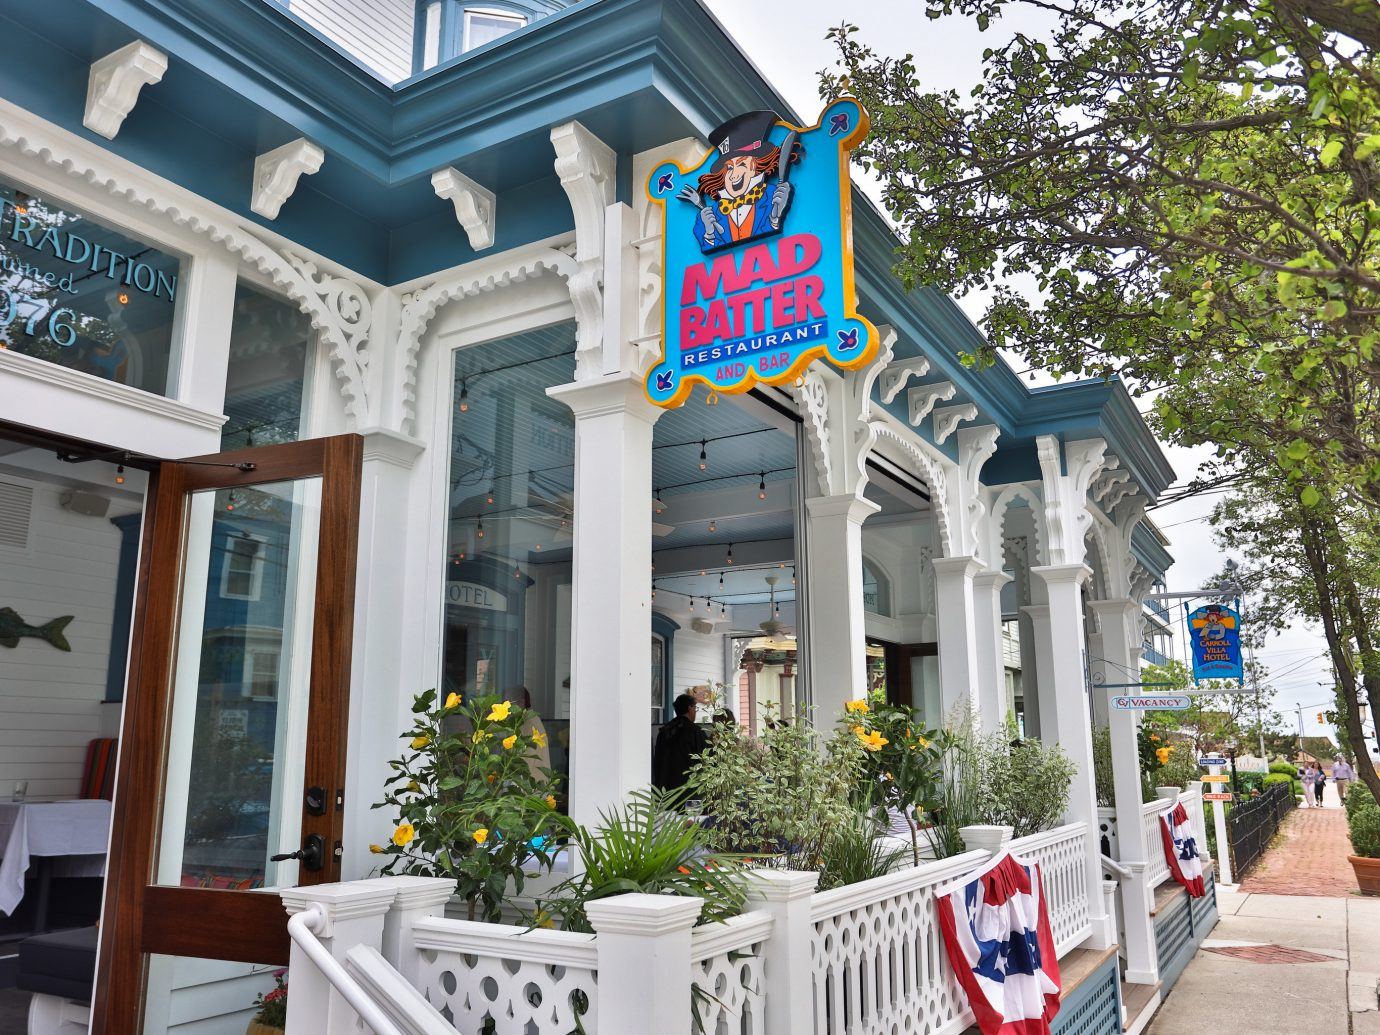 Hotels tree outdoor neighbourhood home restaurant estate Resort